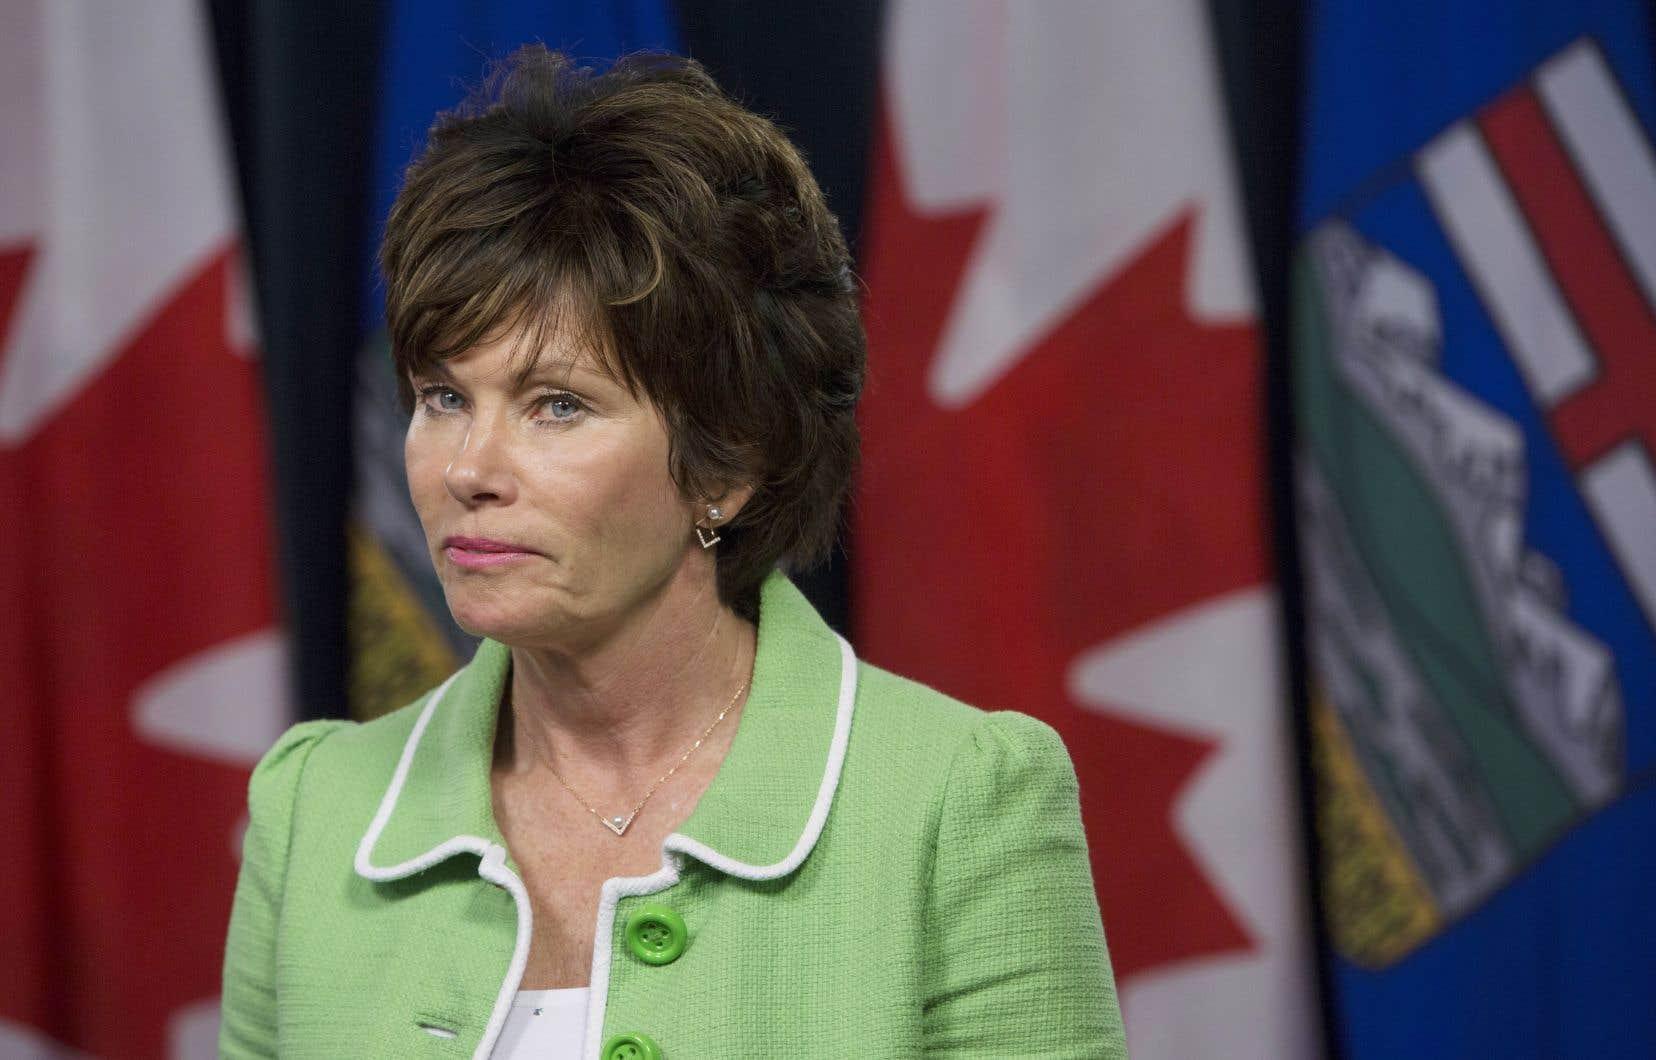 La ministre de l'Énergie de l'Alberta, Sonya Savage